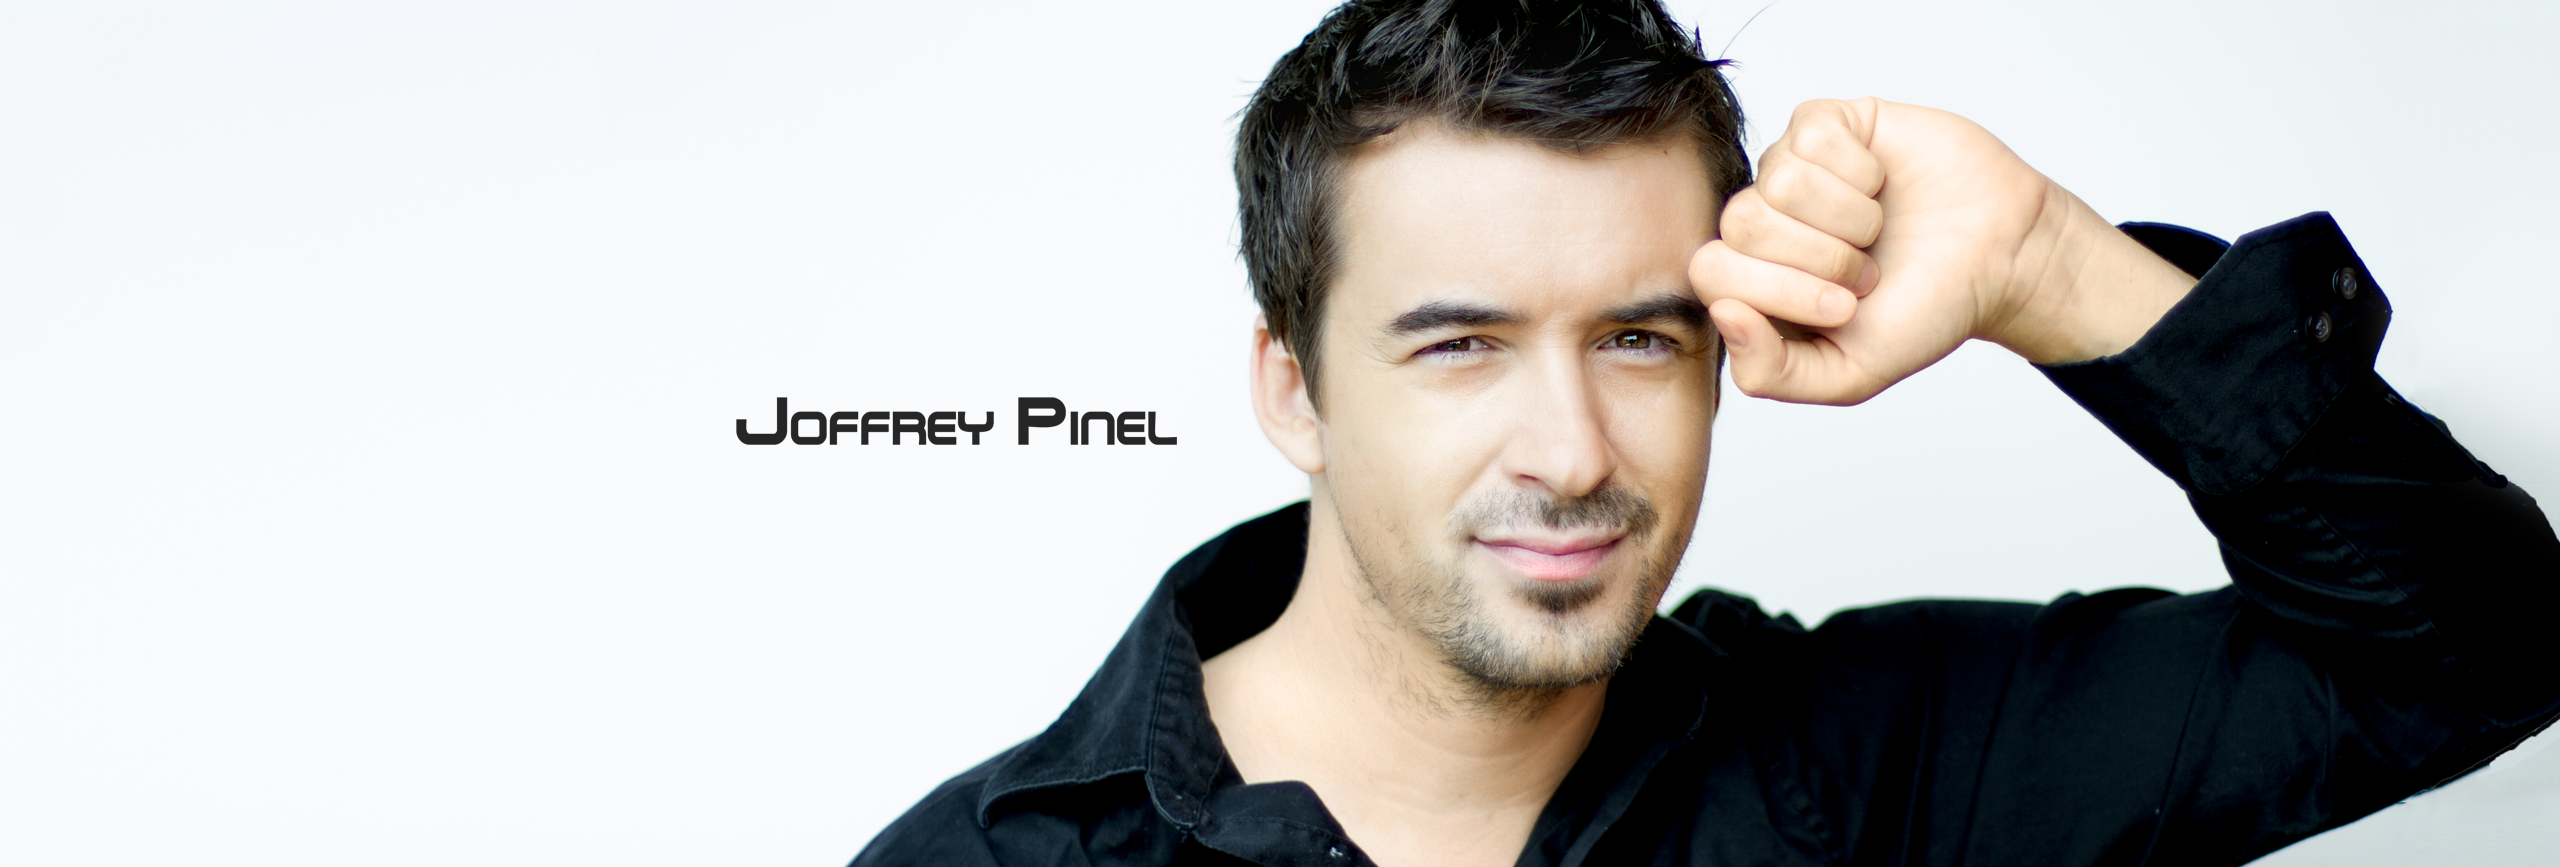 Joffrey Pinel